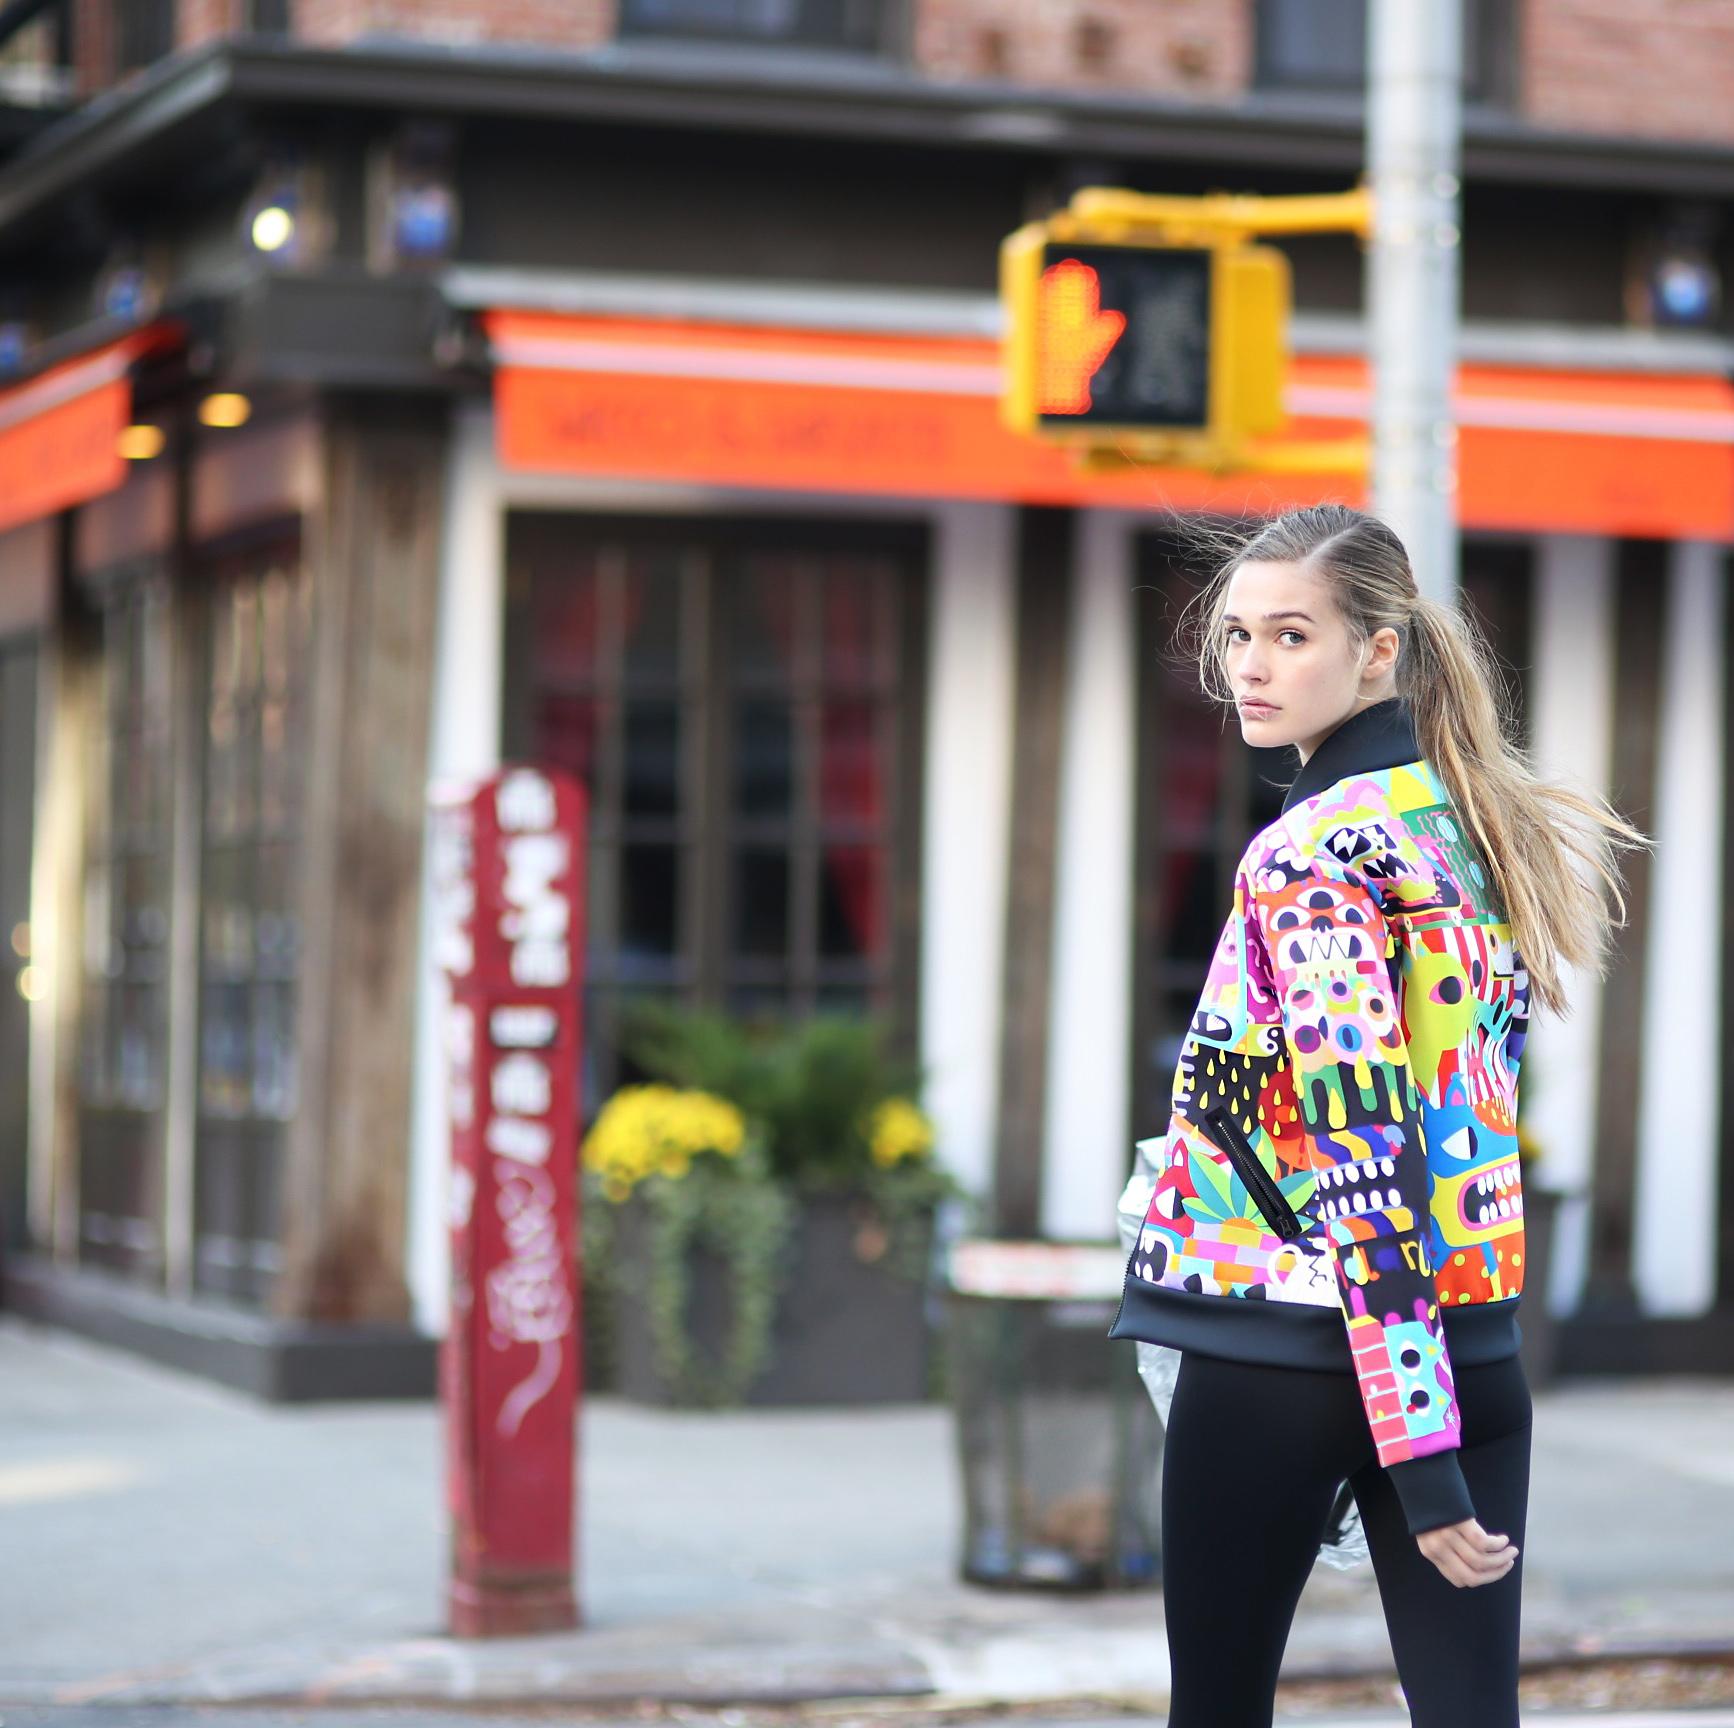 An Ultracor jacket designed by street artist Malarko Hernandez